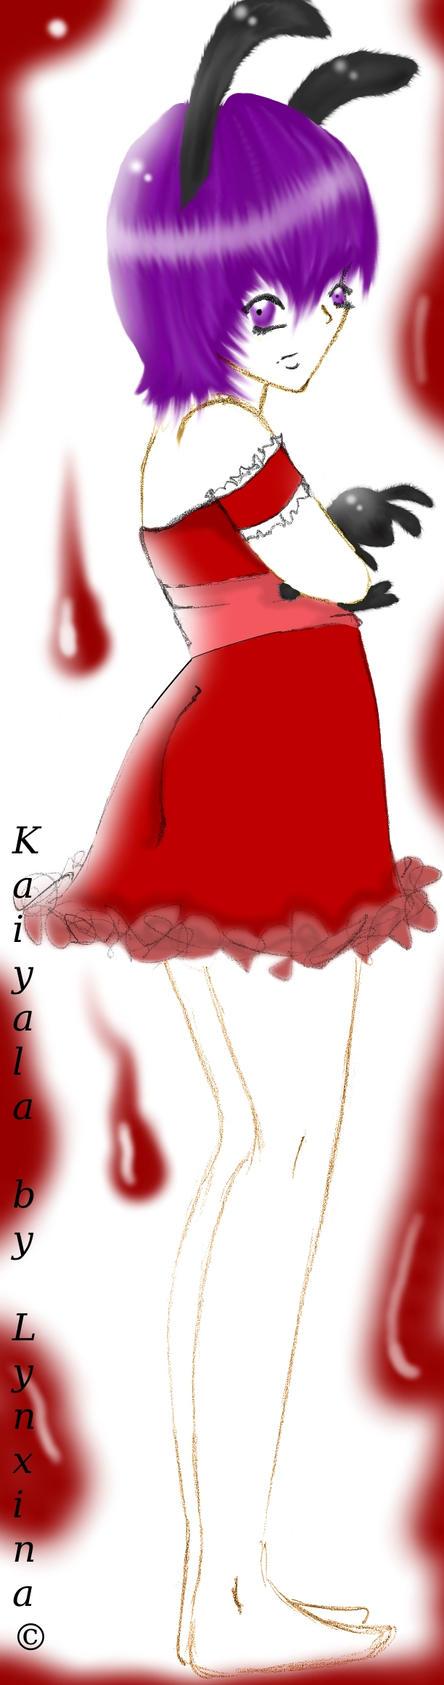 Kaiyala by Lynxina